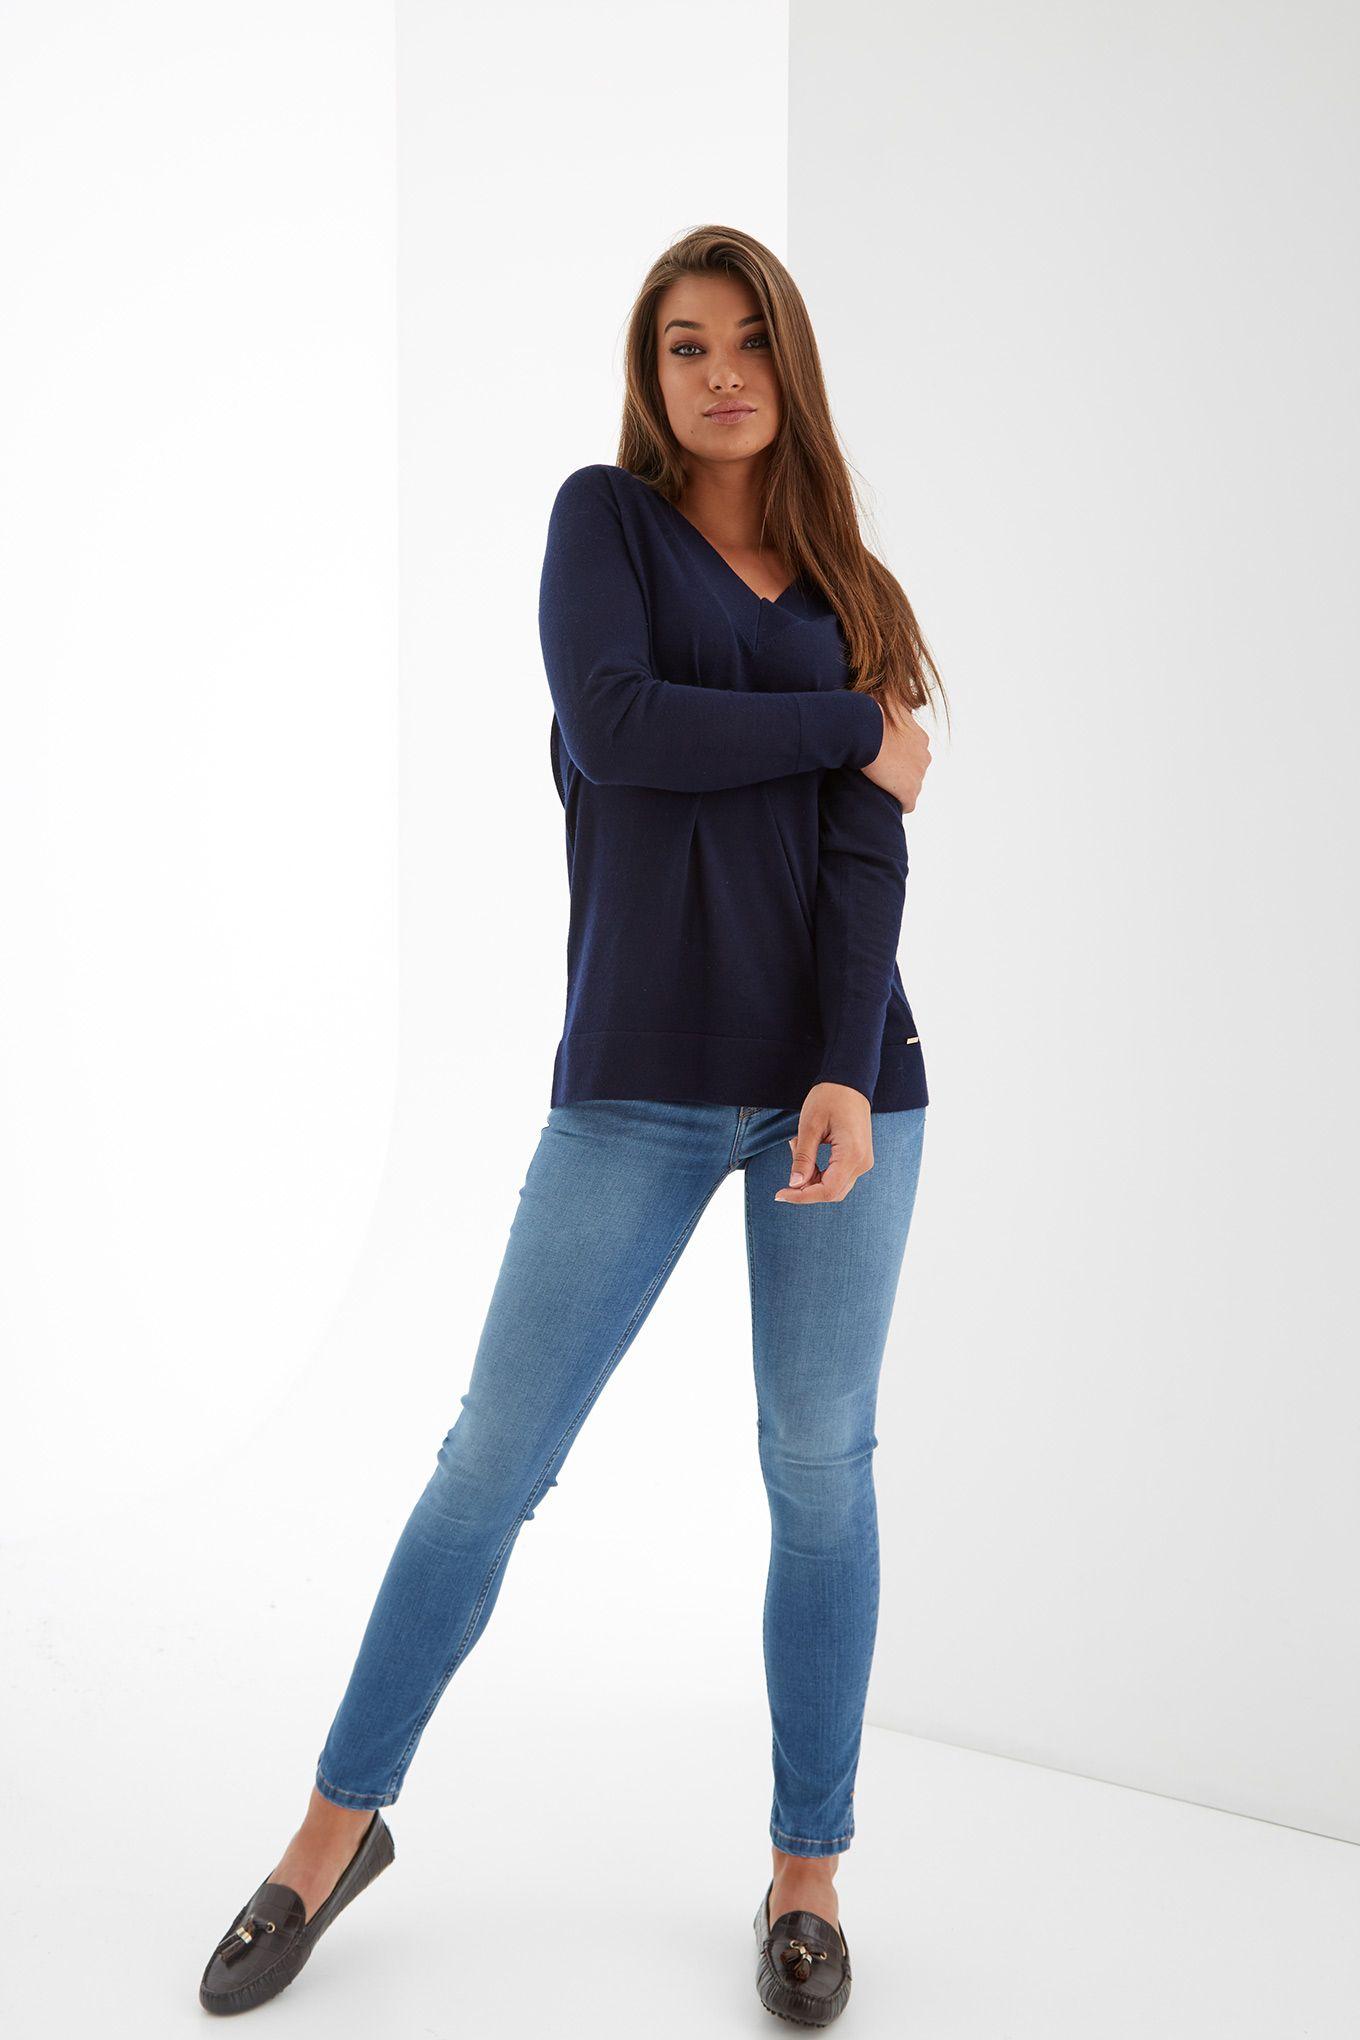 Womens blue v-neck jumper